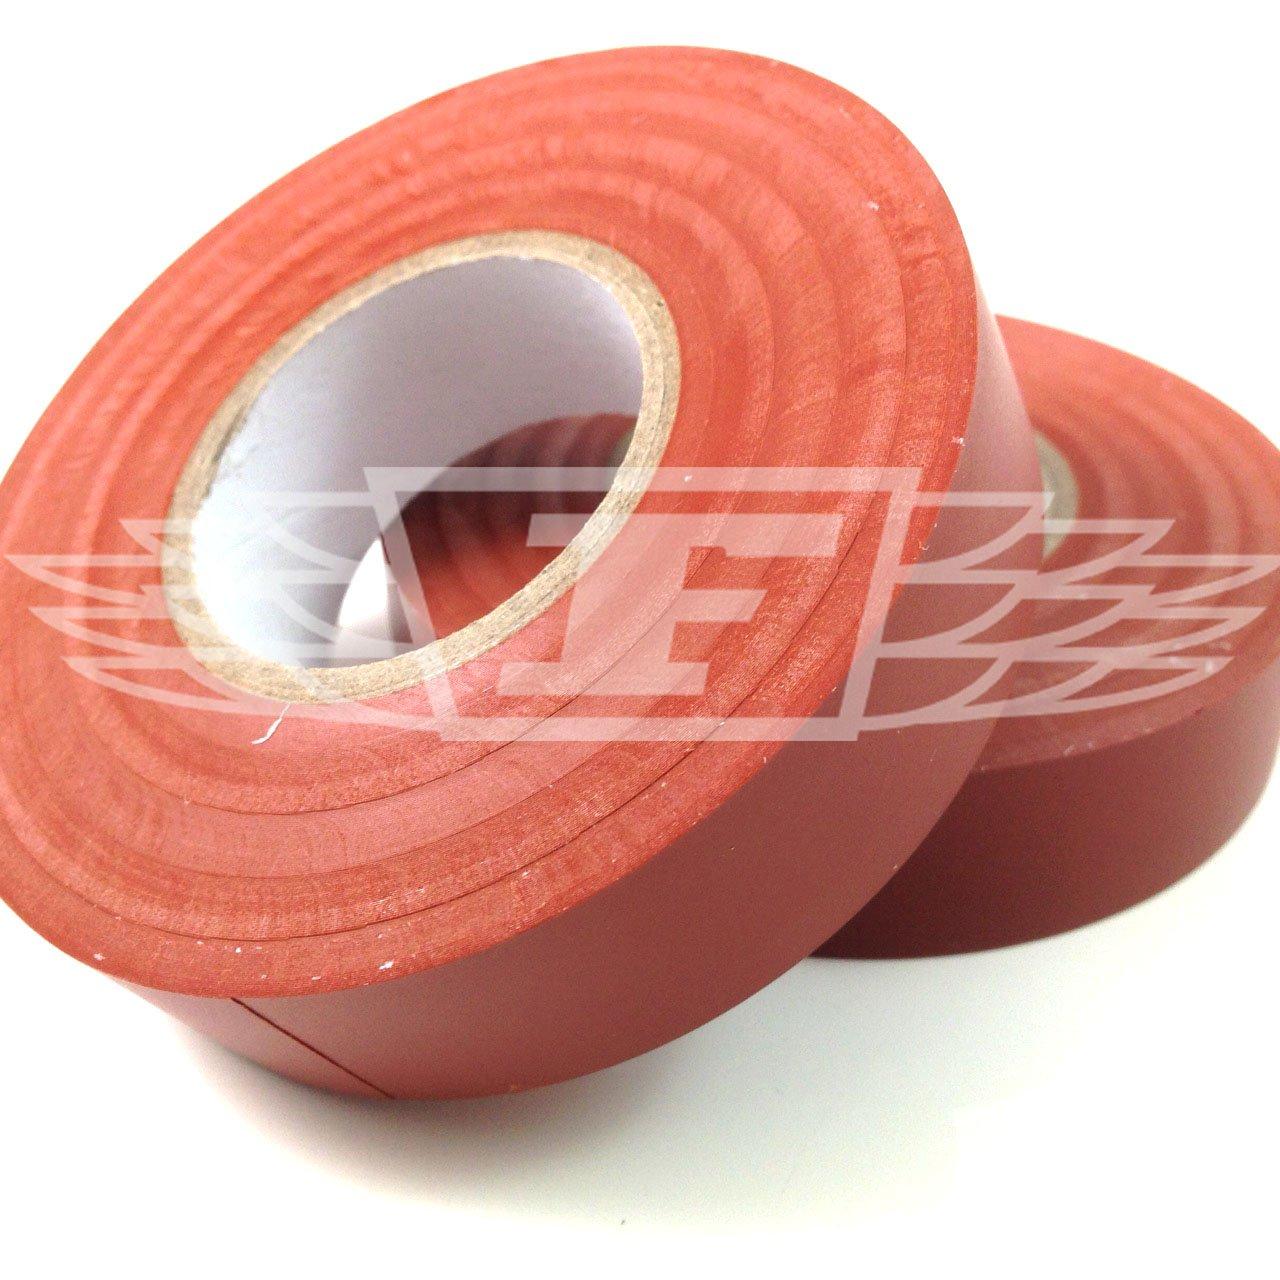 YELLOW 33 Metres Pack of 1 JUMBO ROLL ELECTRICAL PVC INSULATION // INSULATING TAPE FLAME RETARDANT